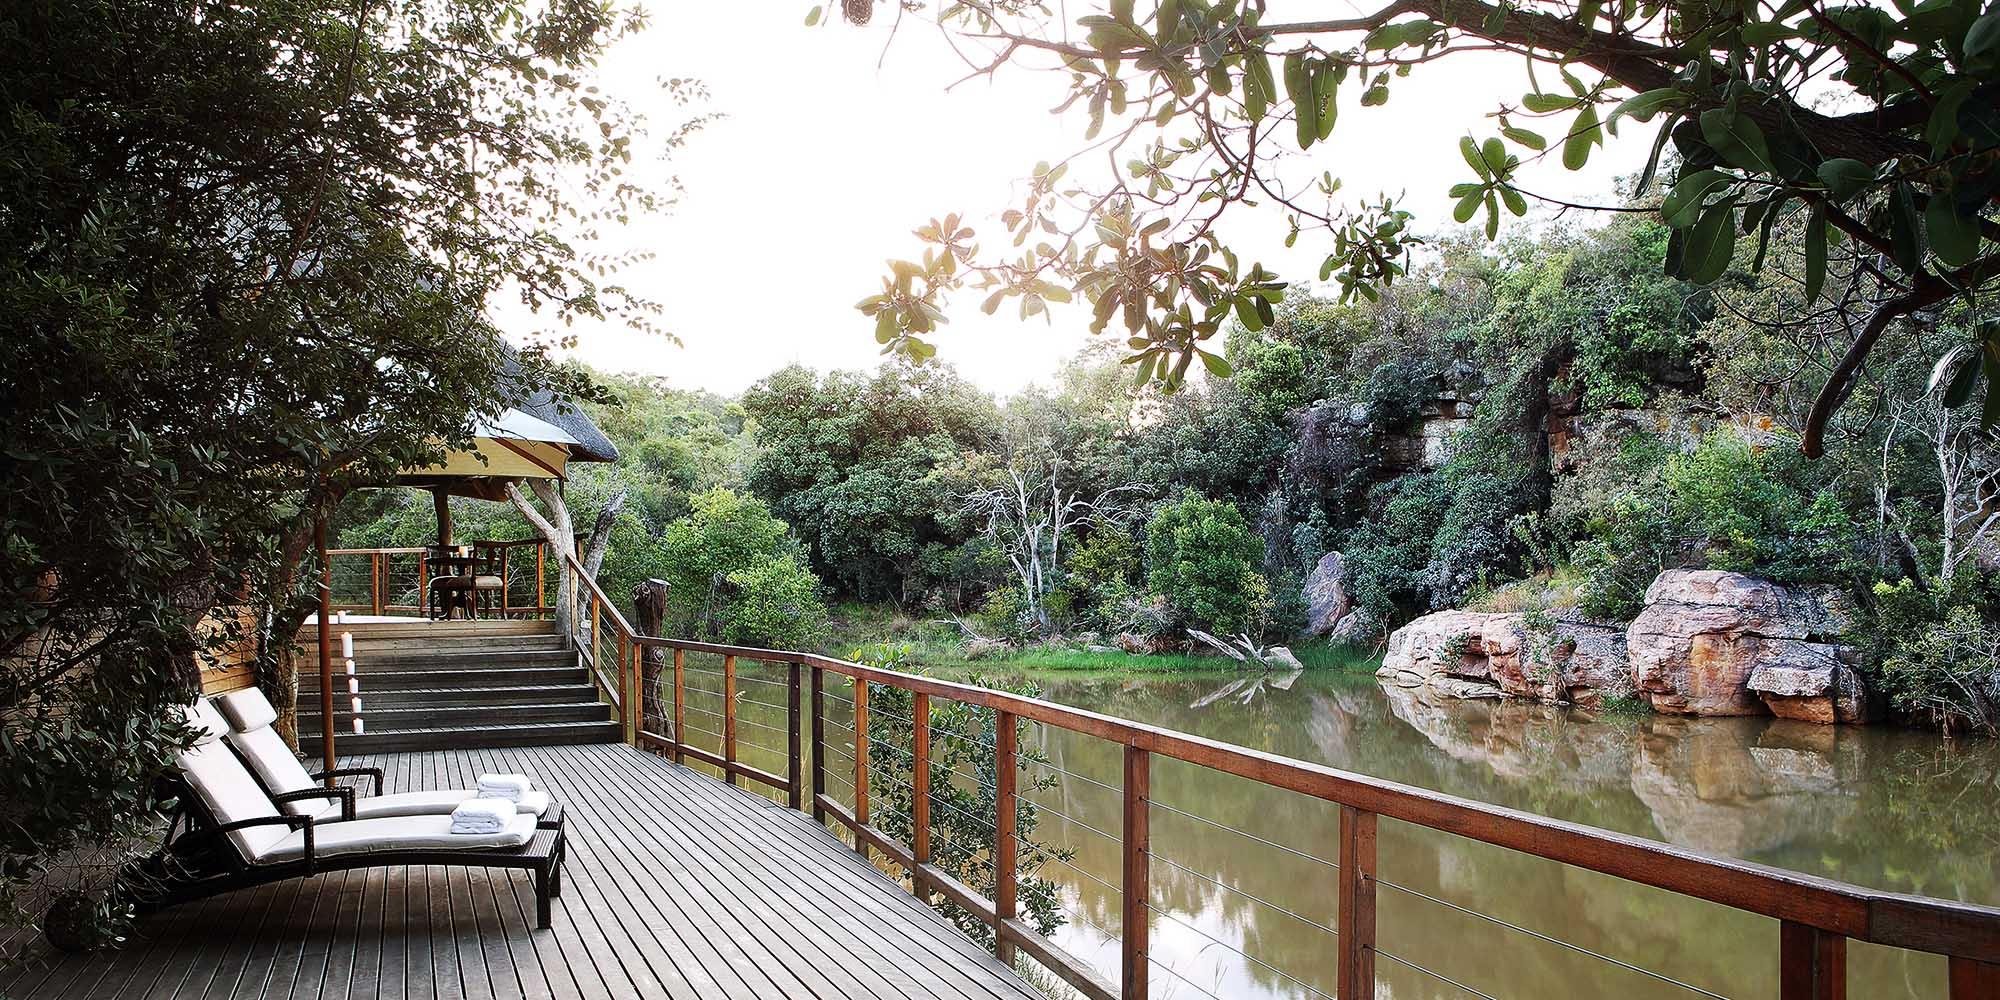 Zulu Camp-Luxury African Safari at Shambala Private Game Reserve